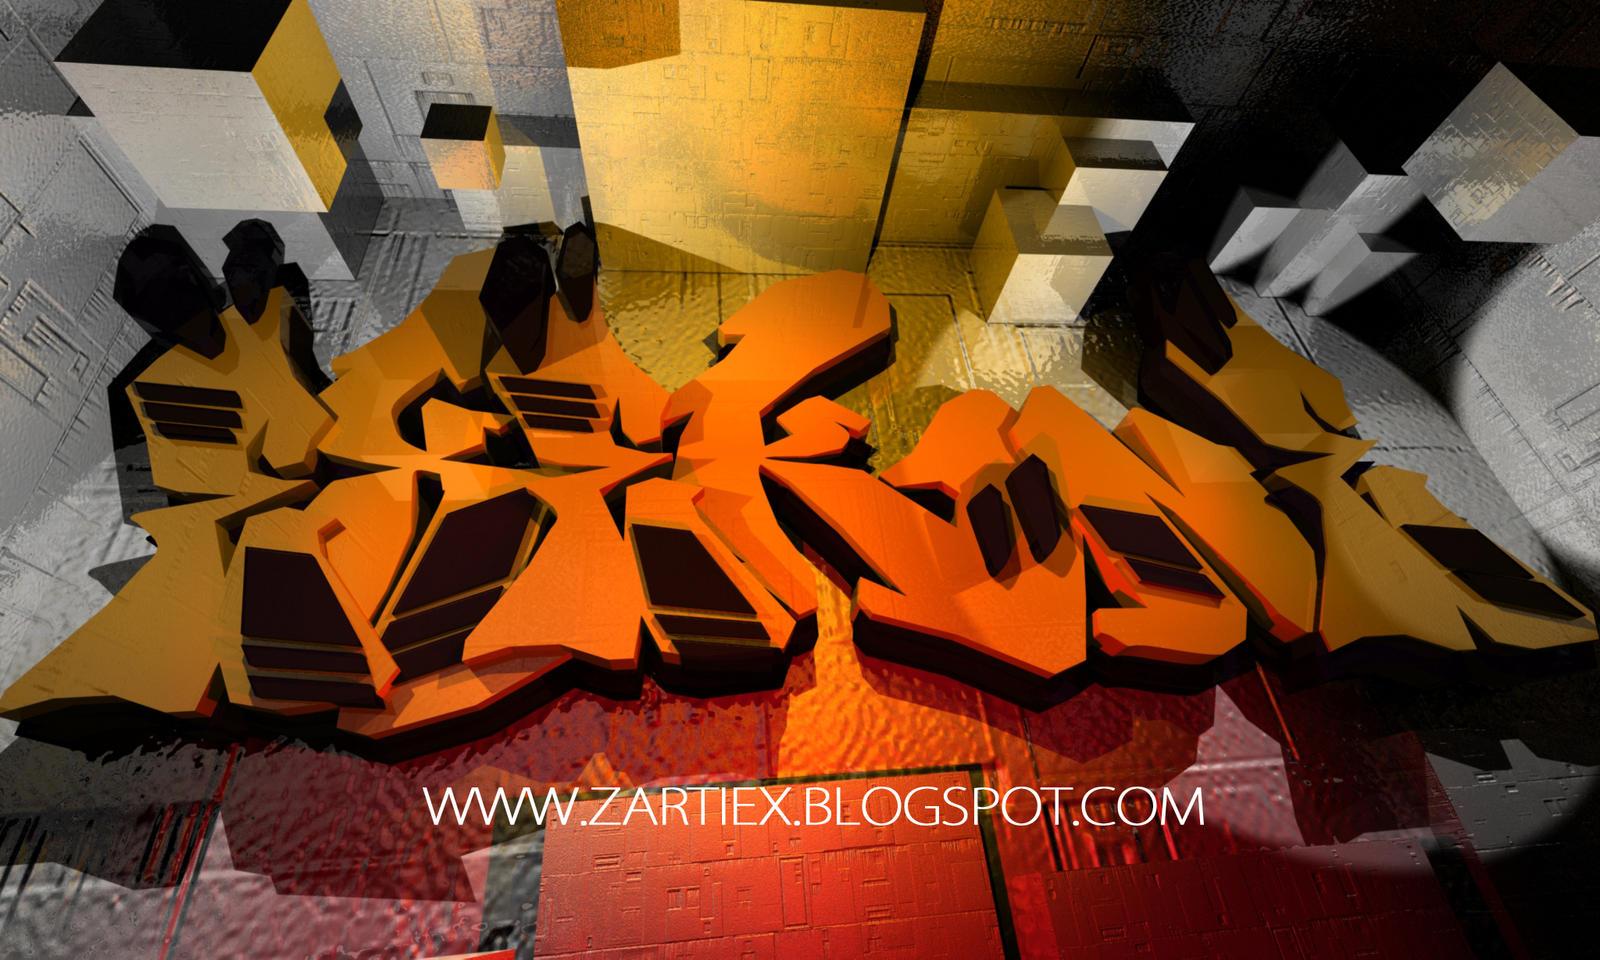 Graffiti creator on mobile - The Graffiti Creator Home Of Graffiti Art 2